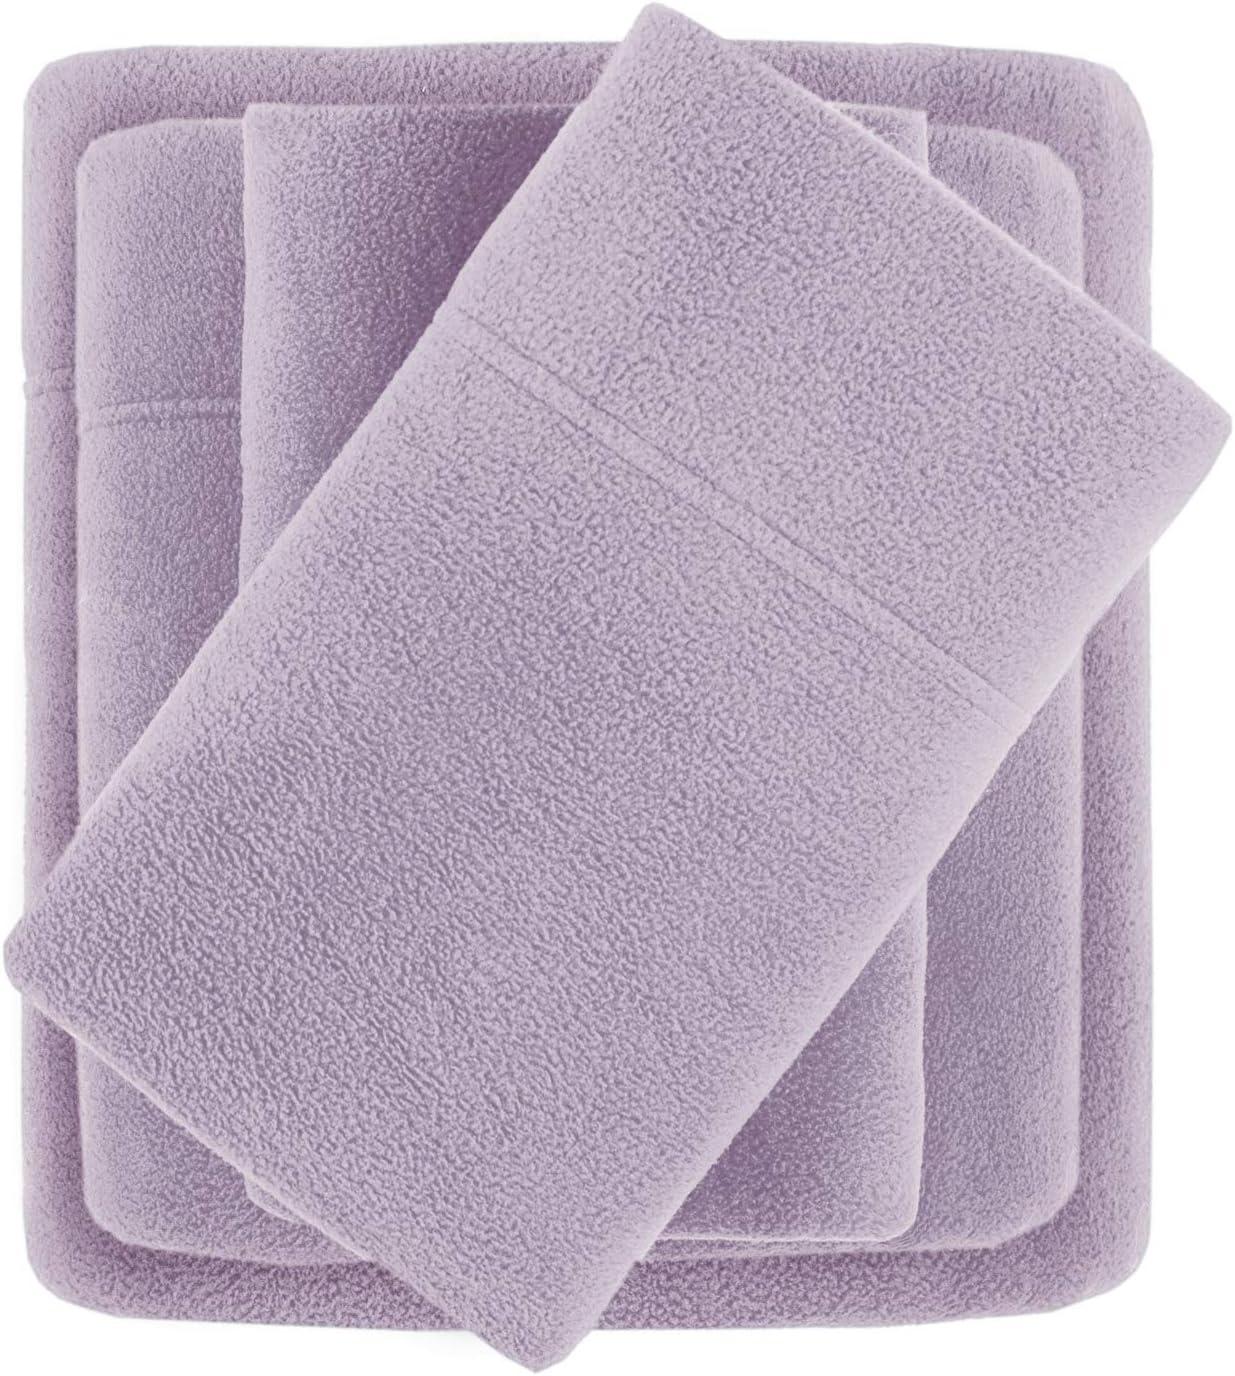 True North by Sleep Philosophy Micro Fleece, Warm, Soft Plush Sheets with 14